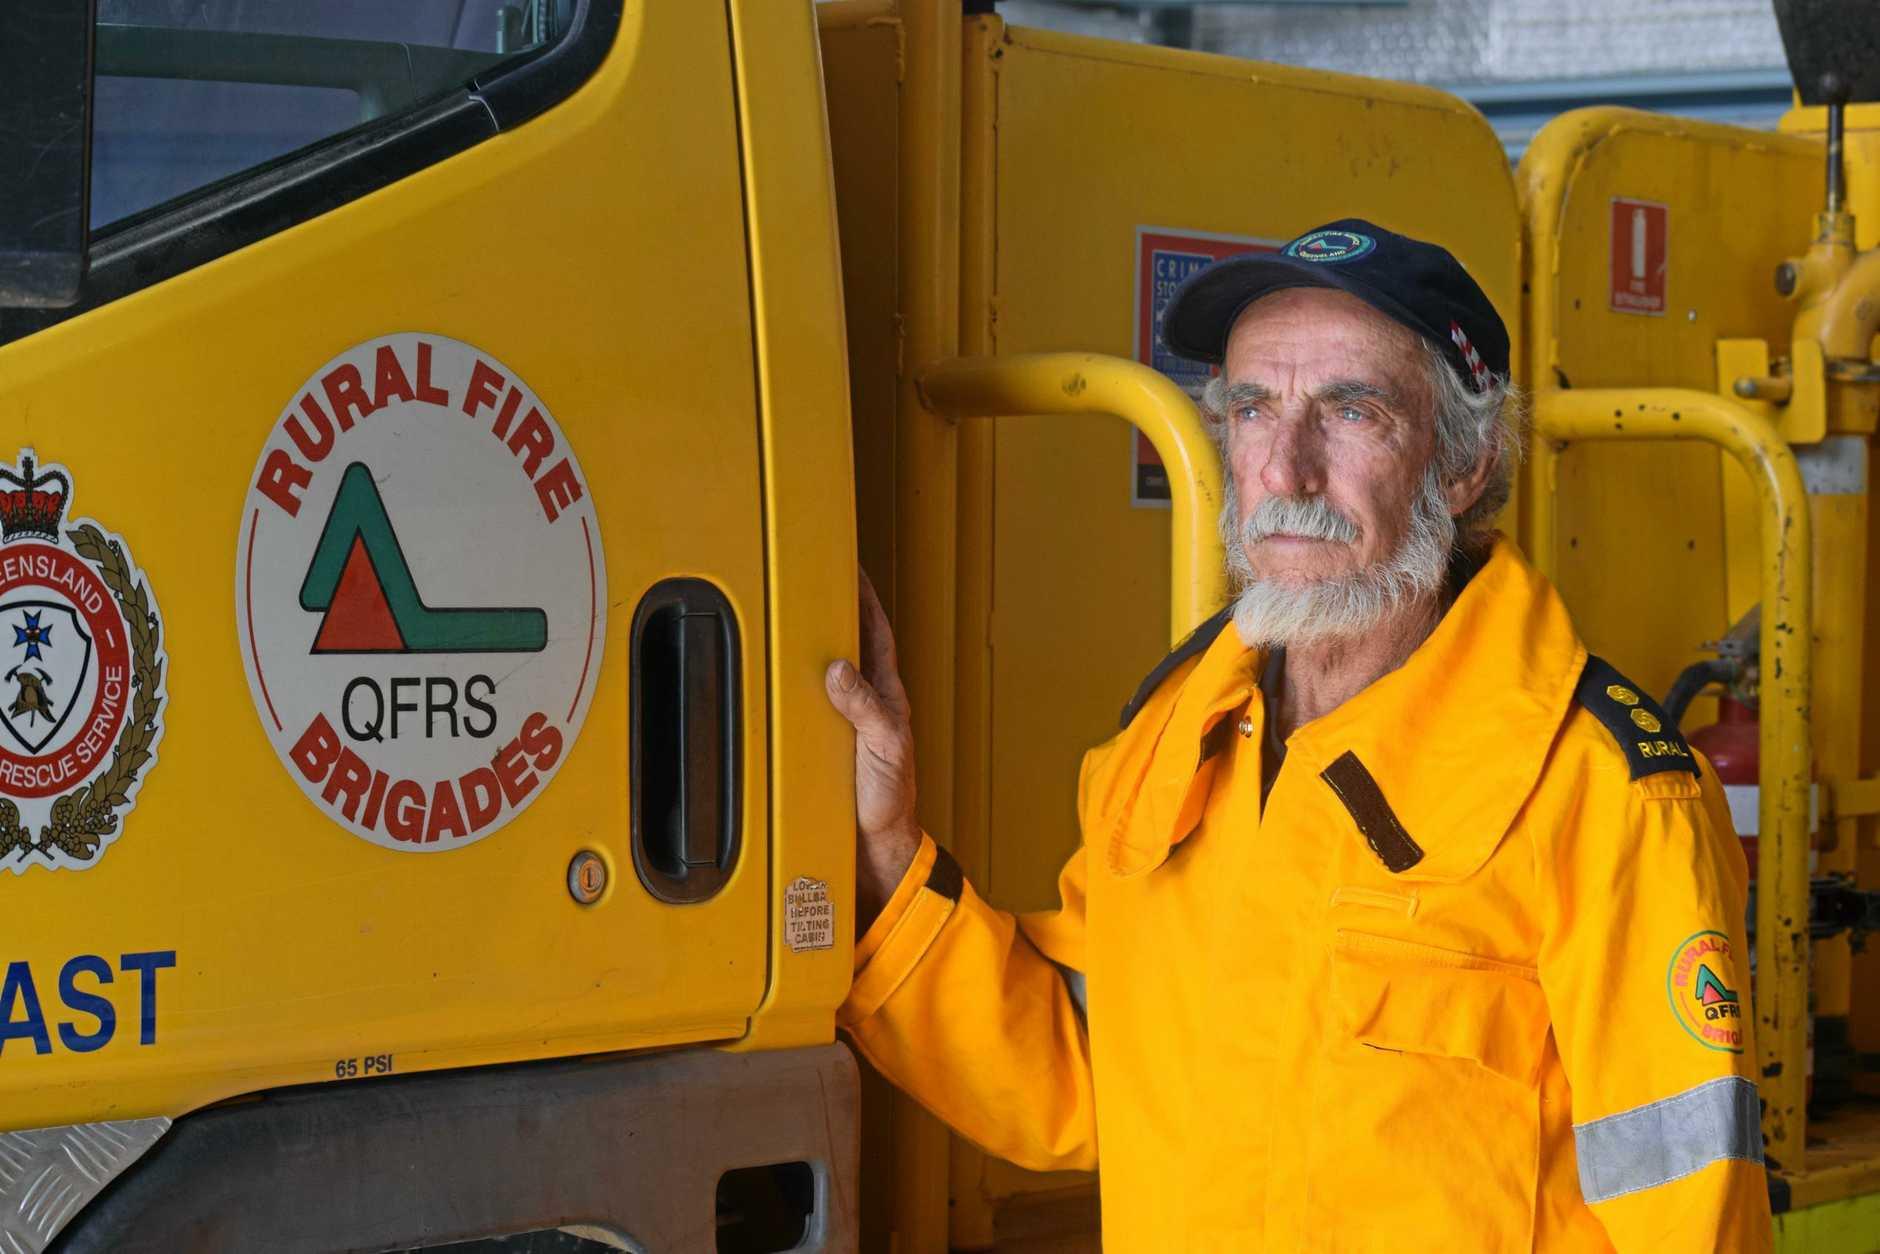 Queesnalnd Rural Fire Service Woolooga first officer Denis Banks